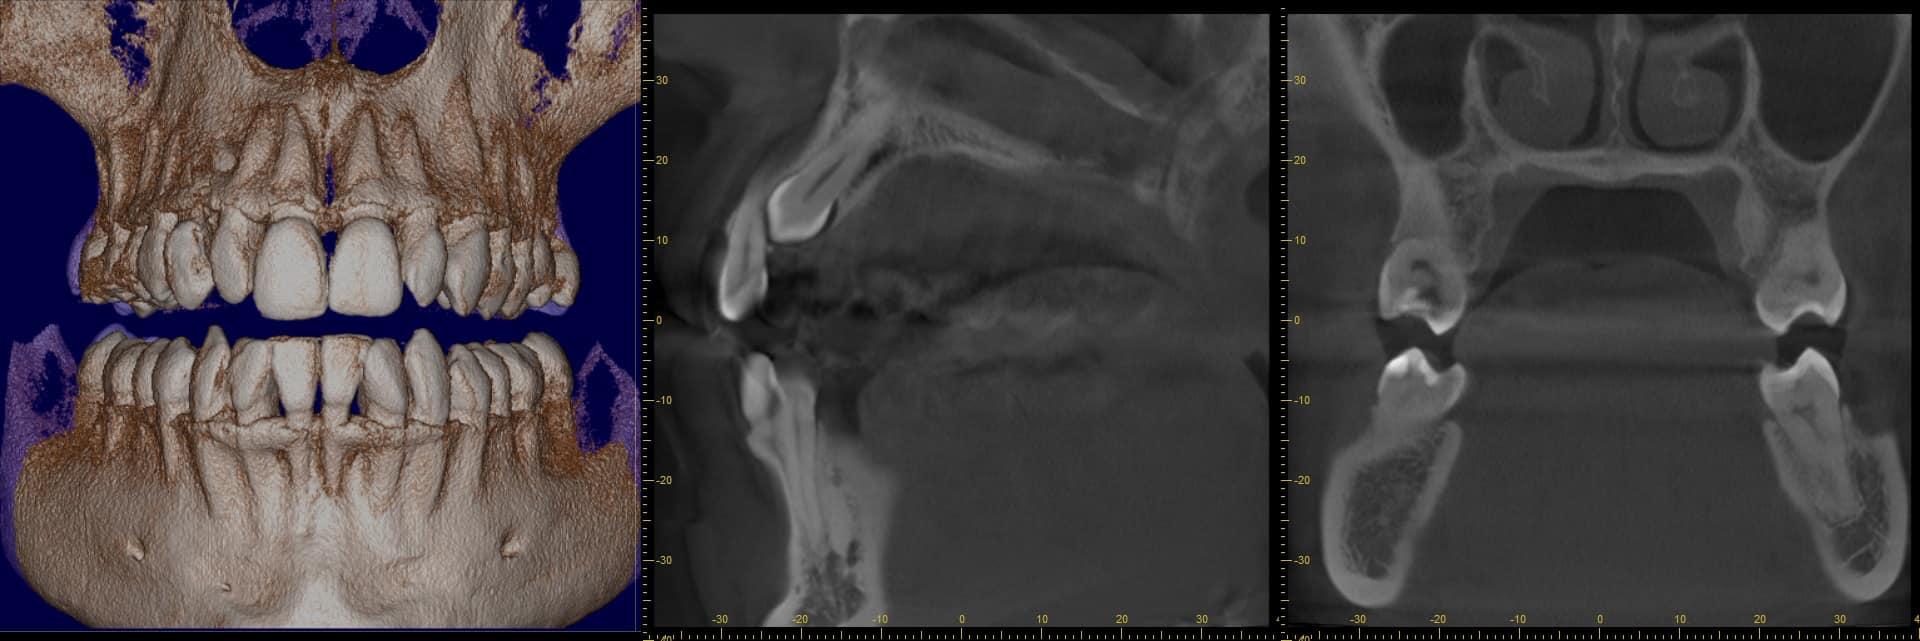 3d röntgen zahnarzt